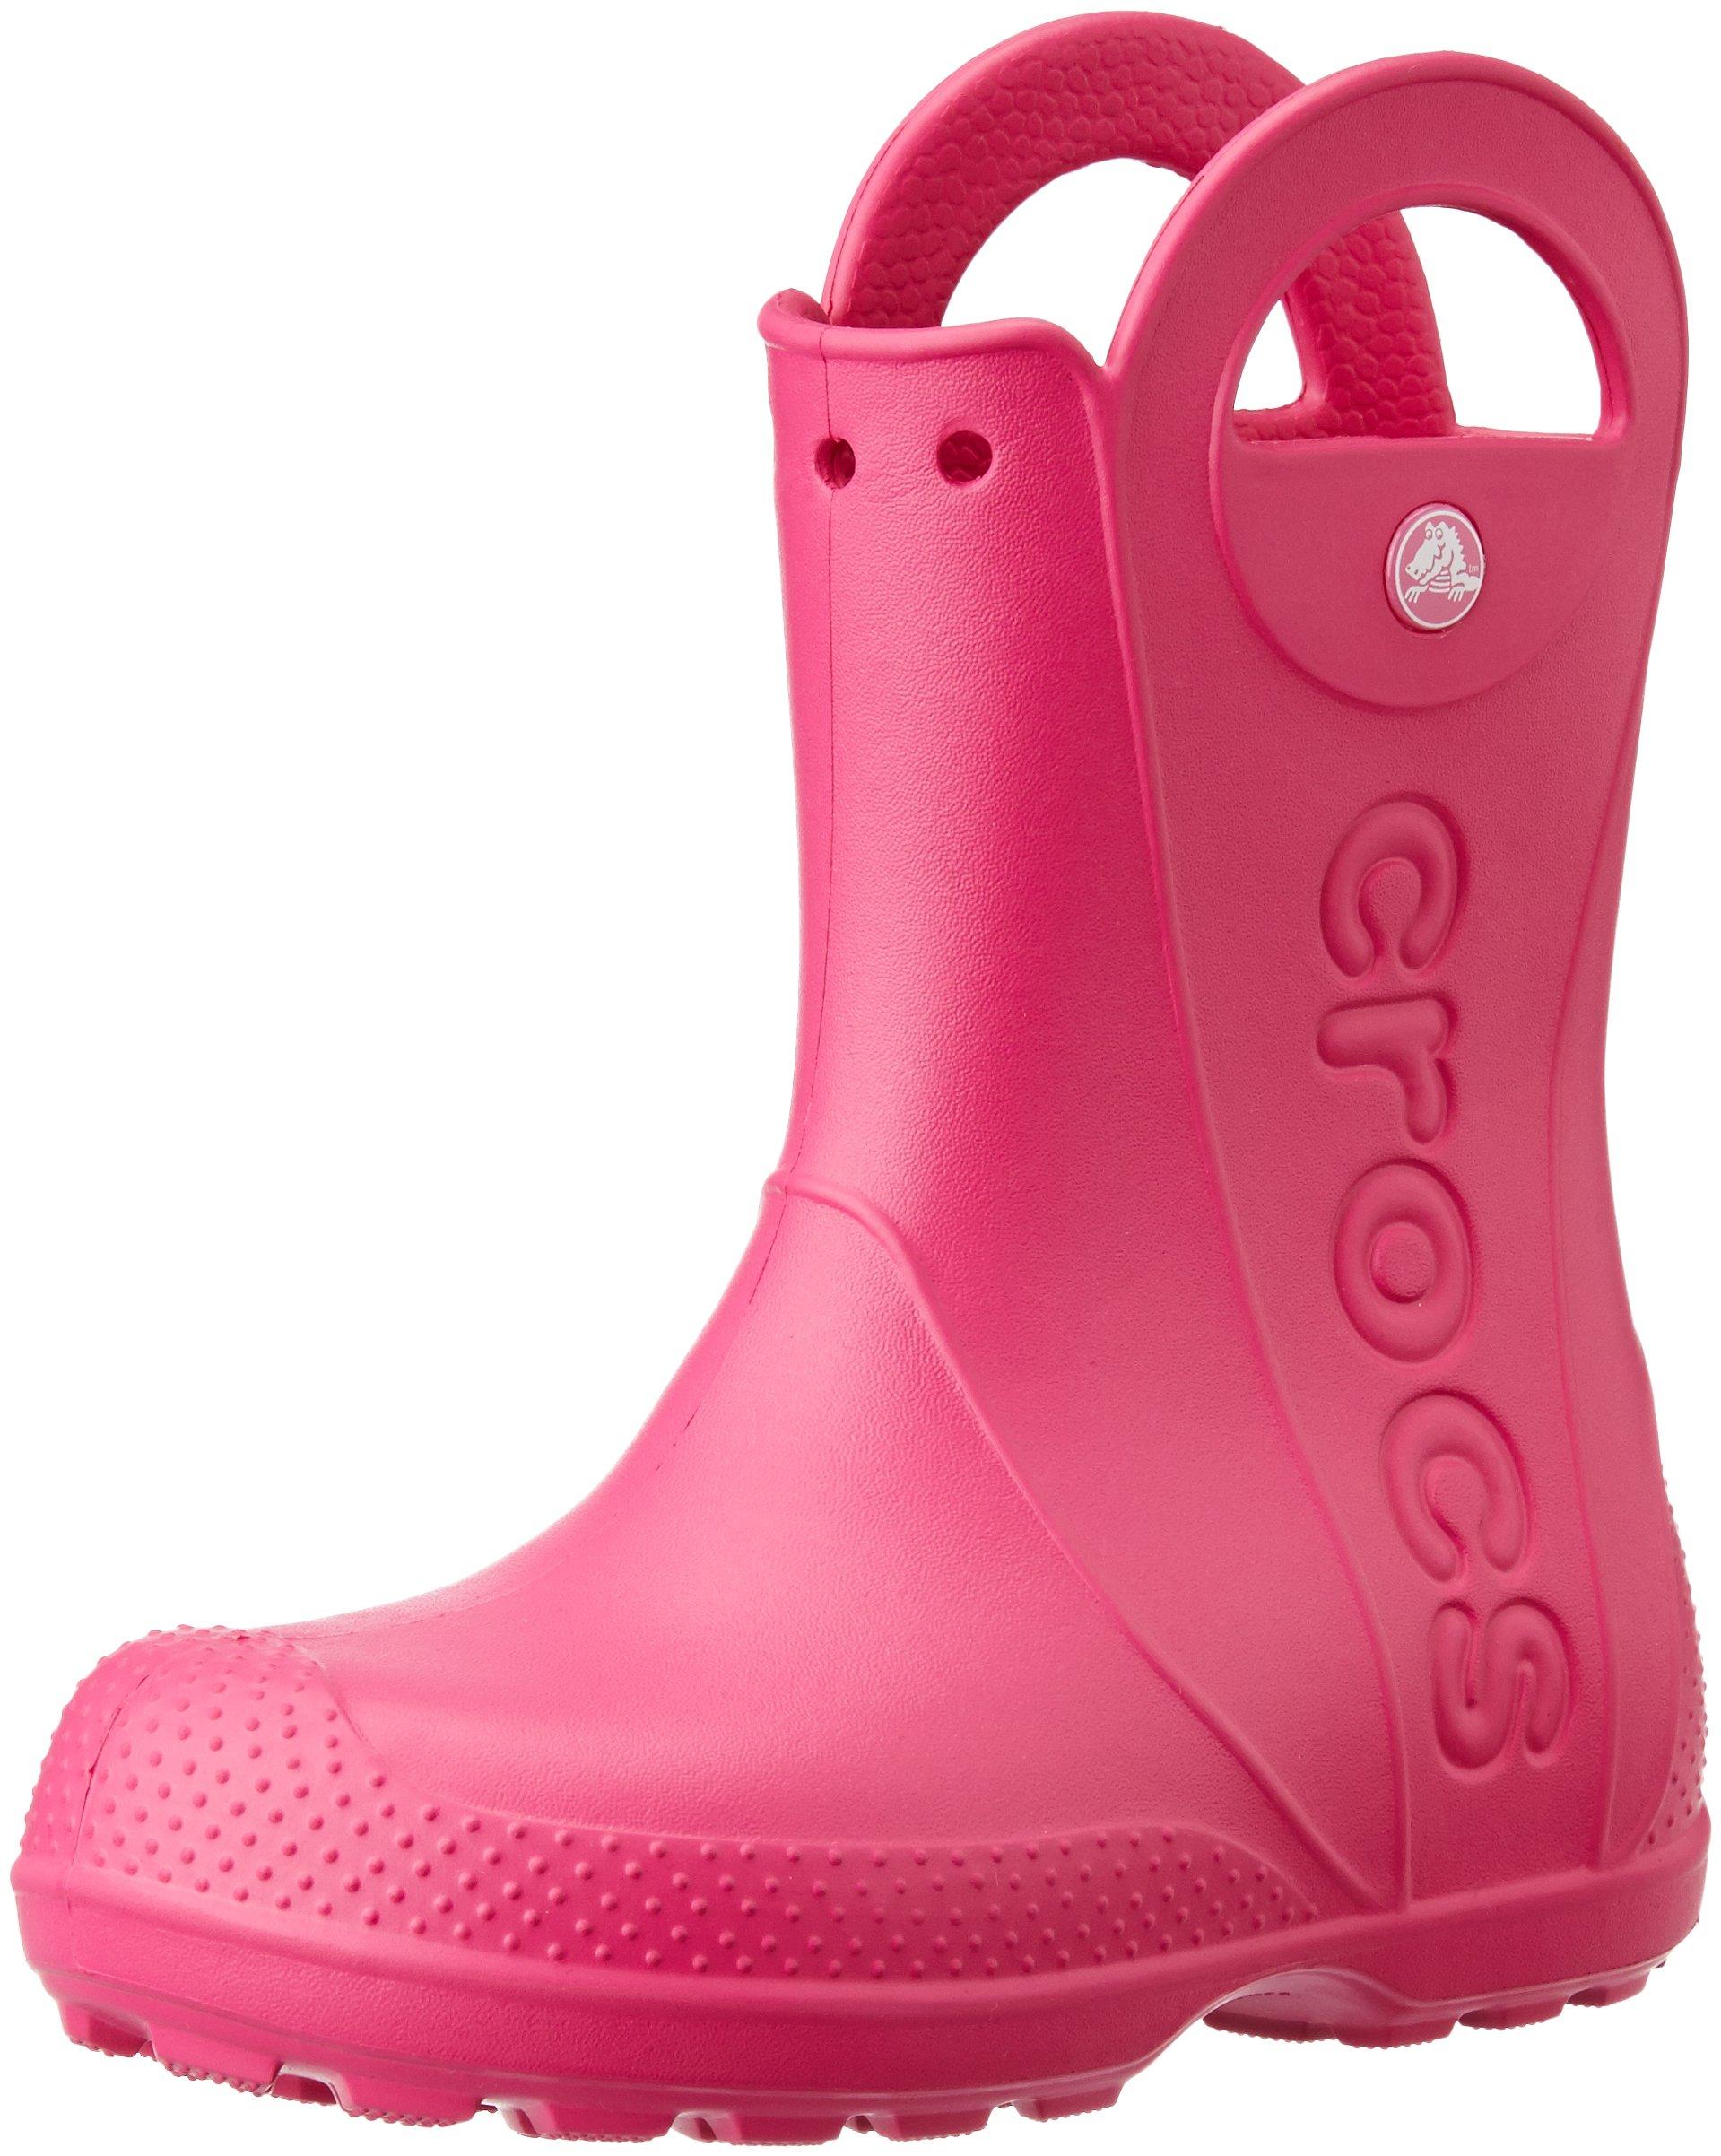 Crocs Kids Handle Rain Boot